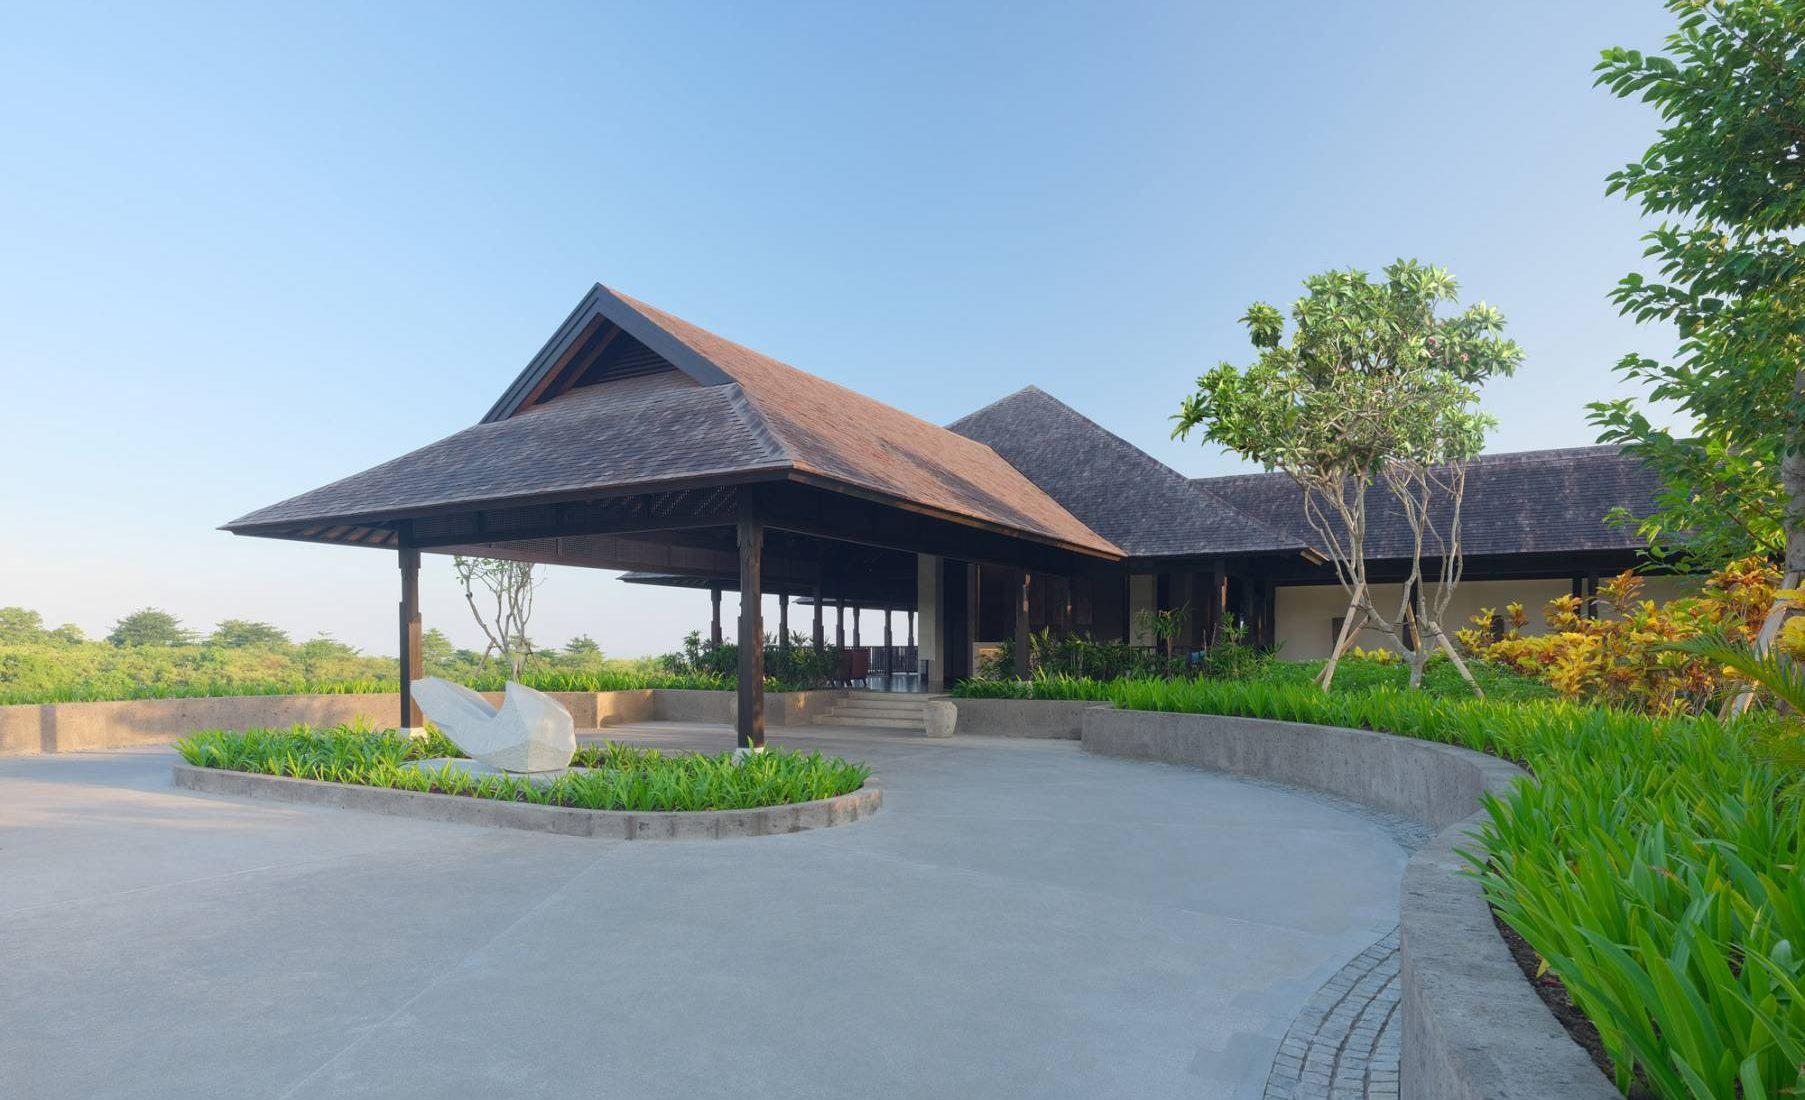 Raffles Bali - Raffles Bali's Iconic Sculpture by Richard North-Lewis